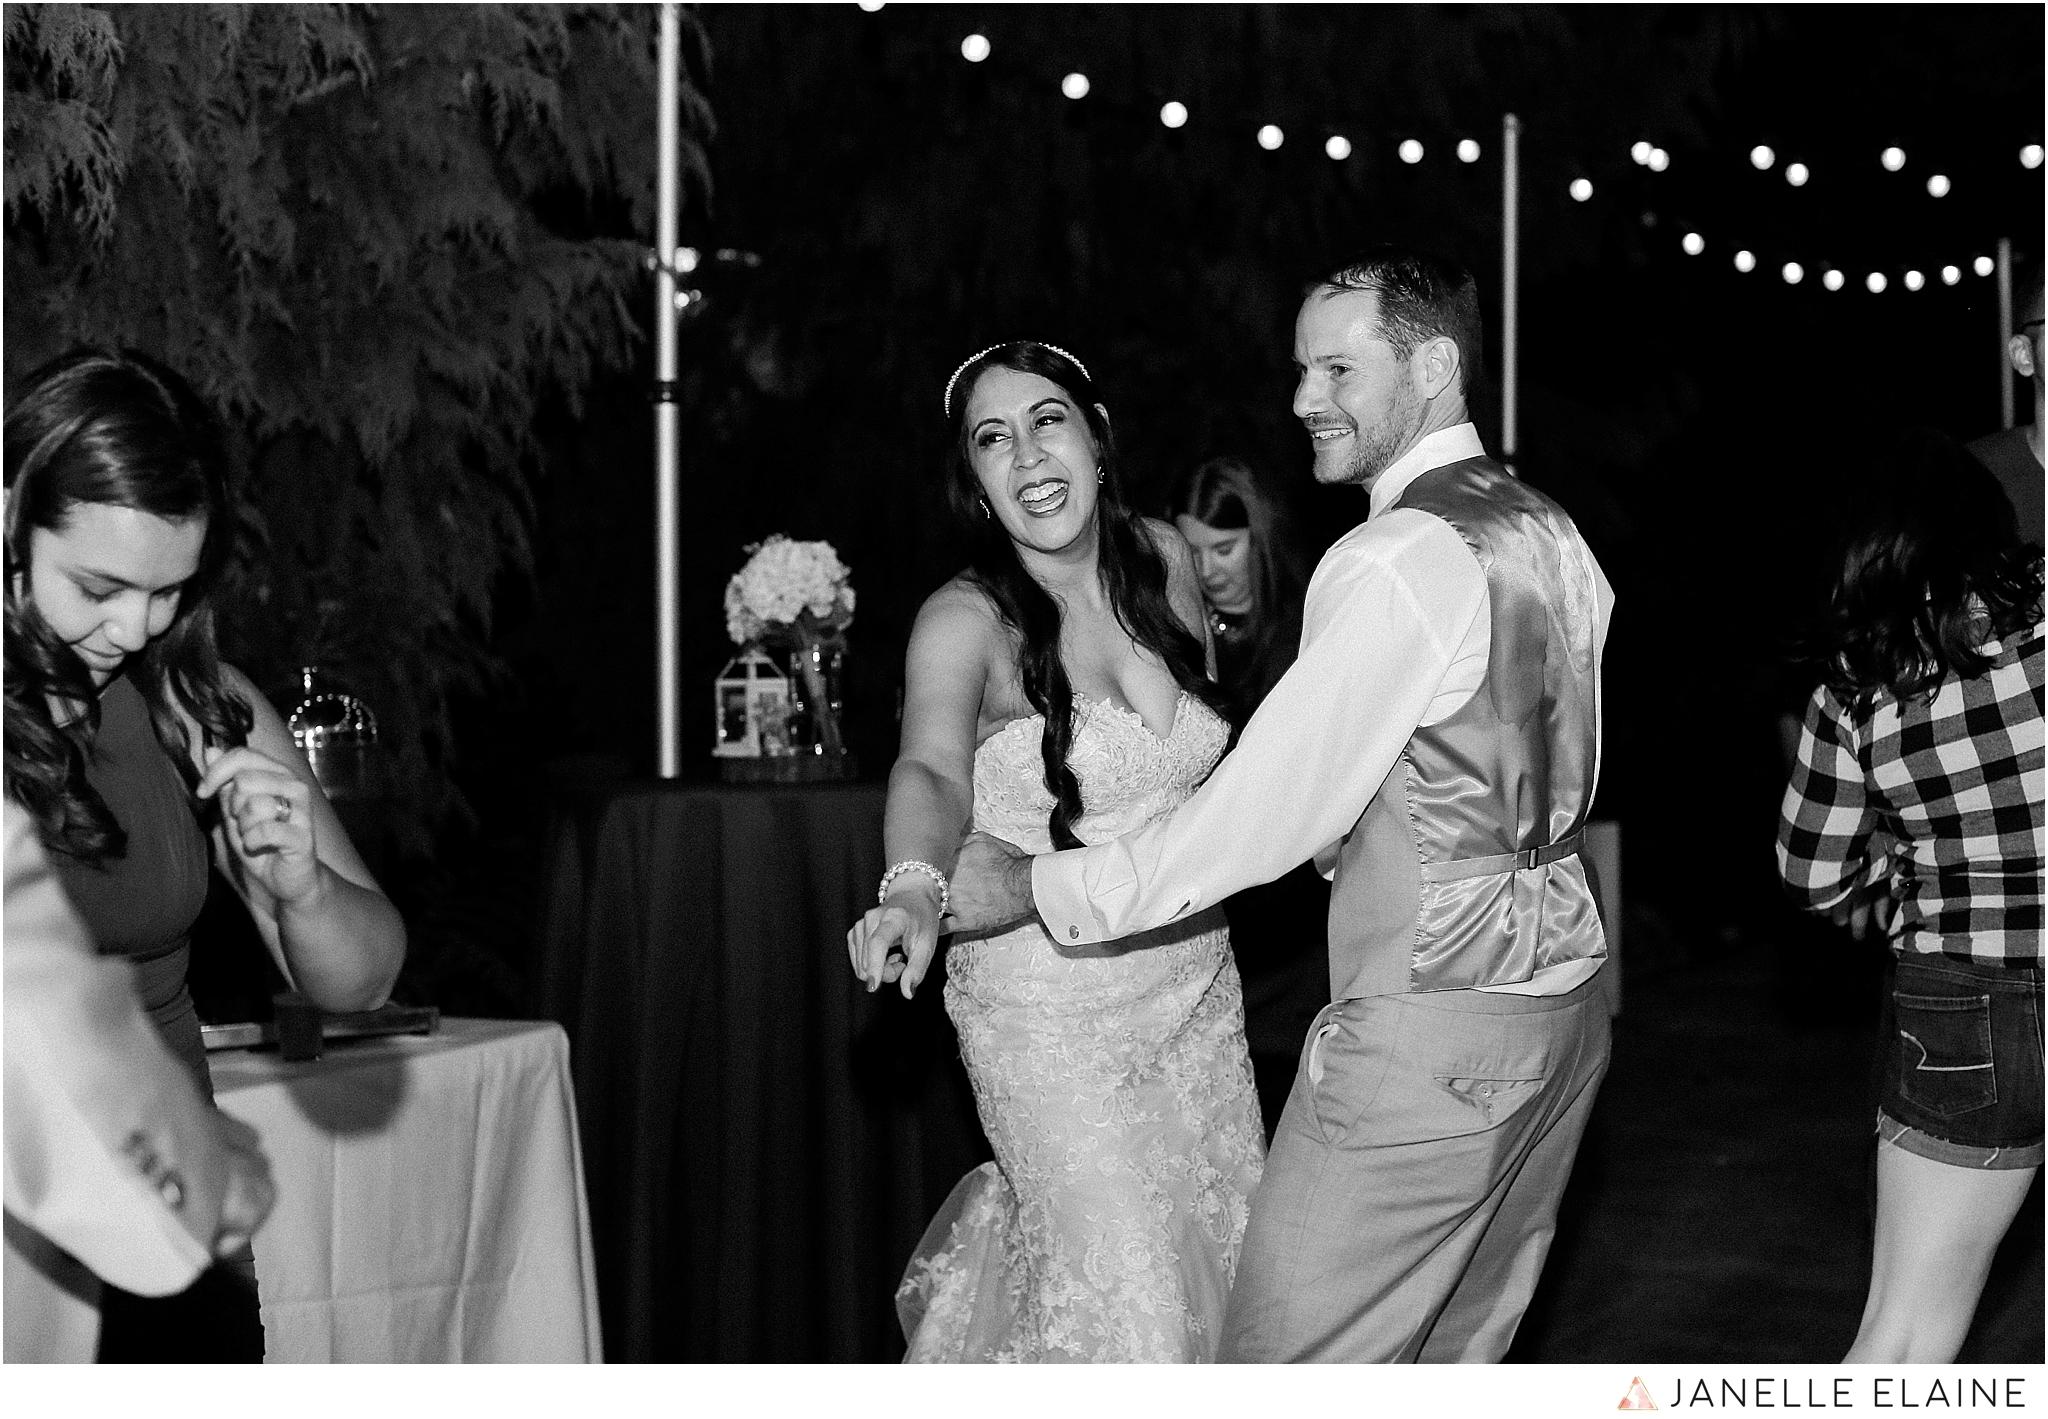 janelle elaine photography-professional wedding photographer-seattle-bellevue-robinswood house-310.jpg